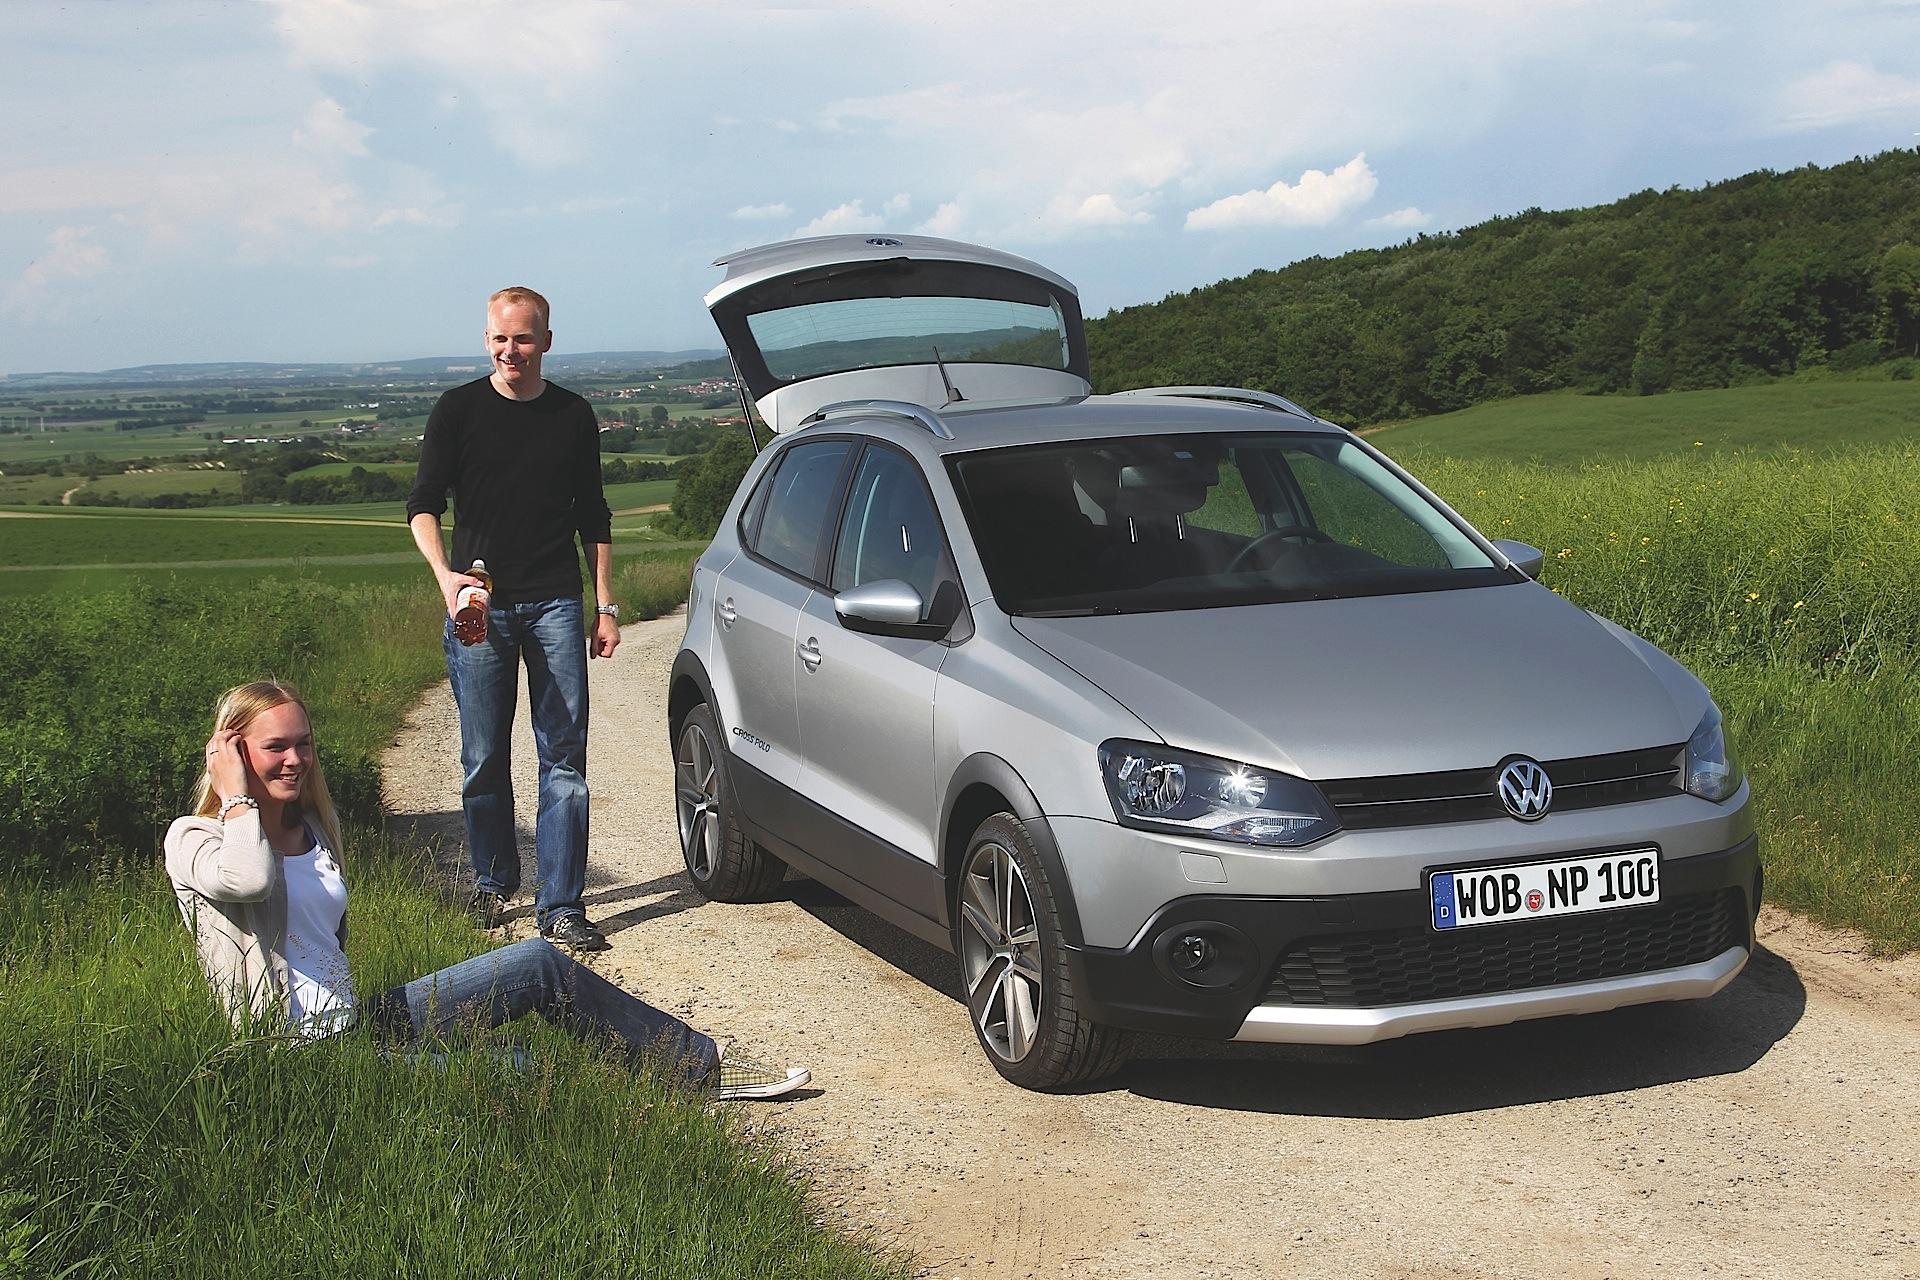 Volkswagen Crosspolo Specs Amp Photos 2010 2011 2012 2013 2014 2015 2016 2017 2018 2019